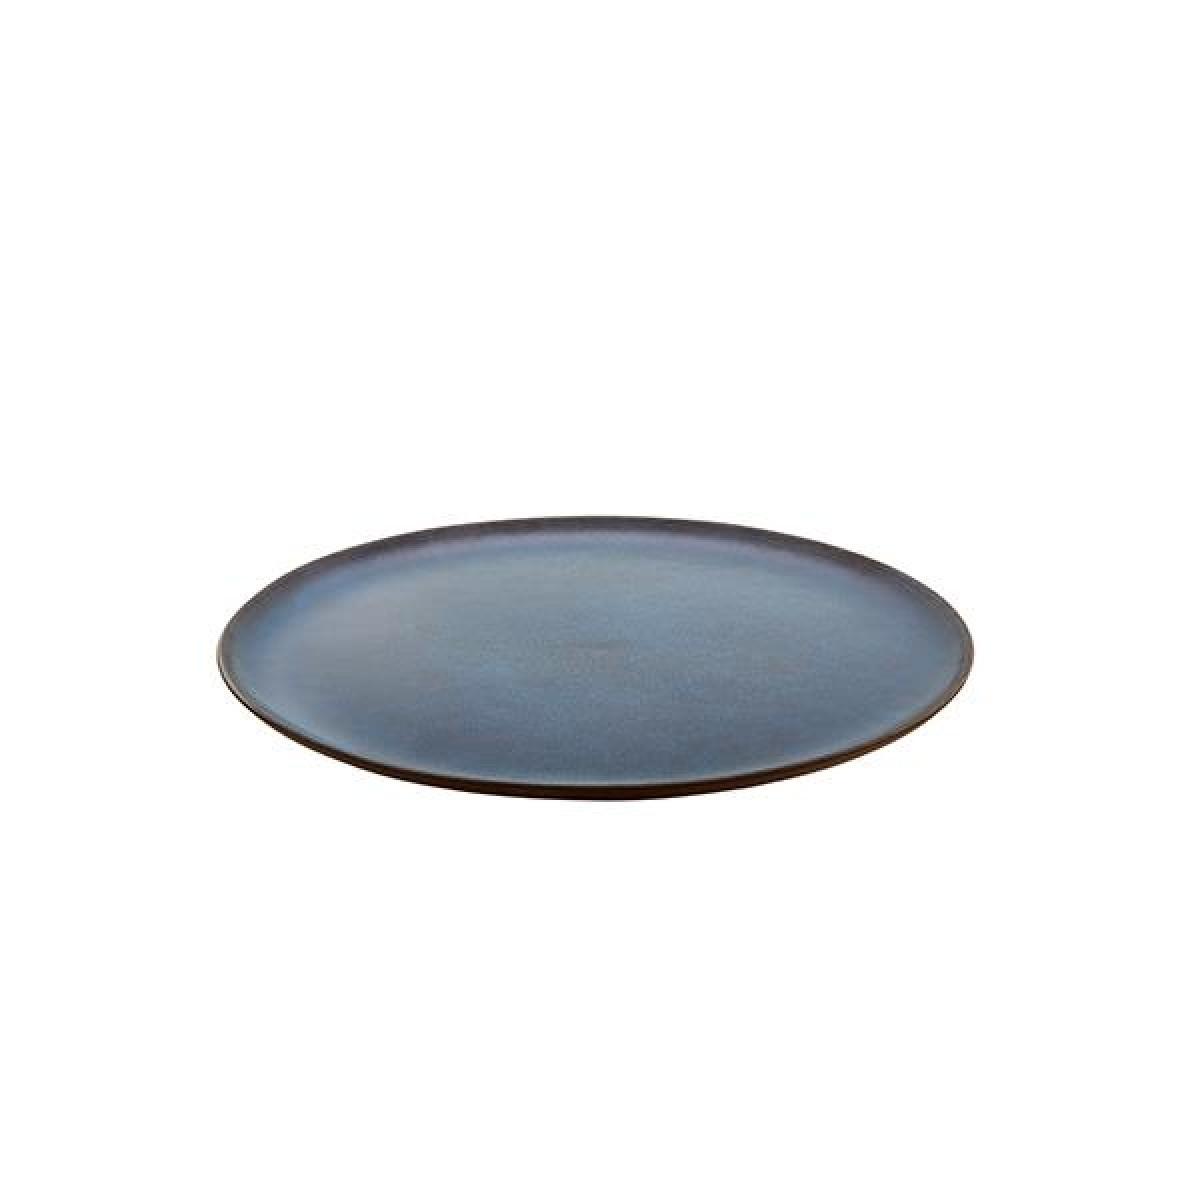 AIDA Raw middagstallerken 28 cm - midnight blue